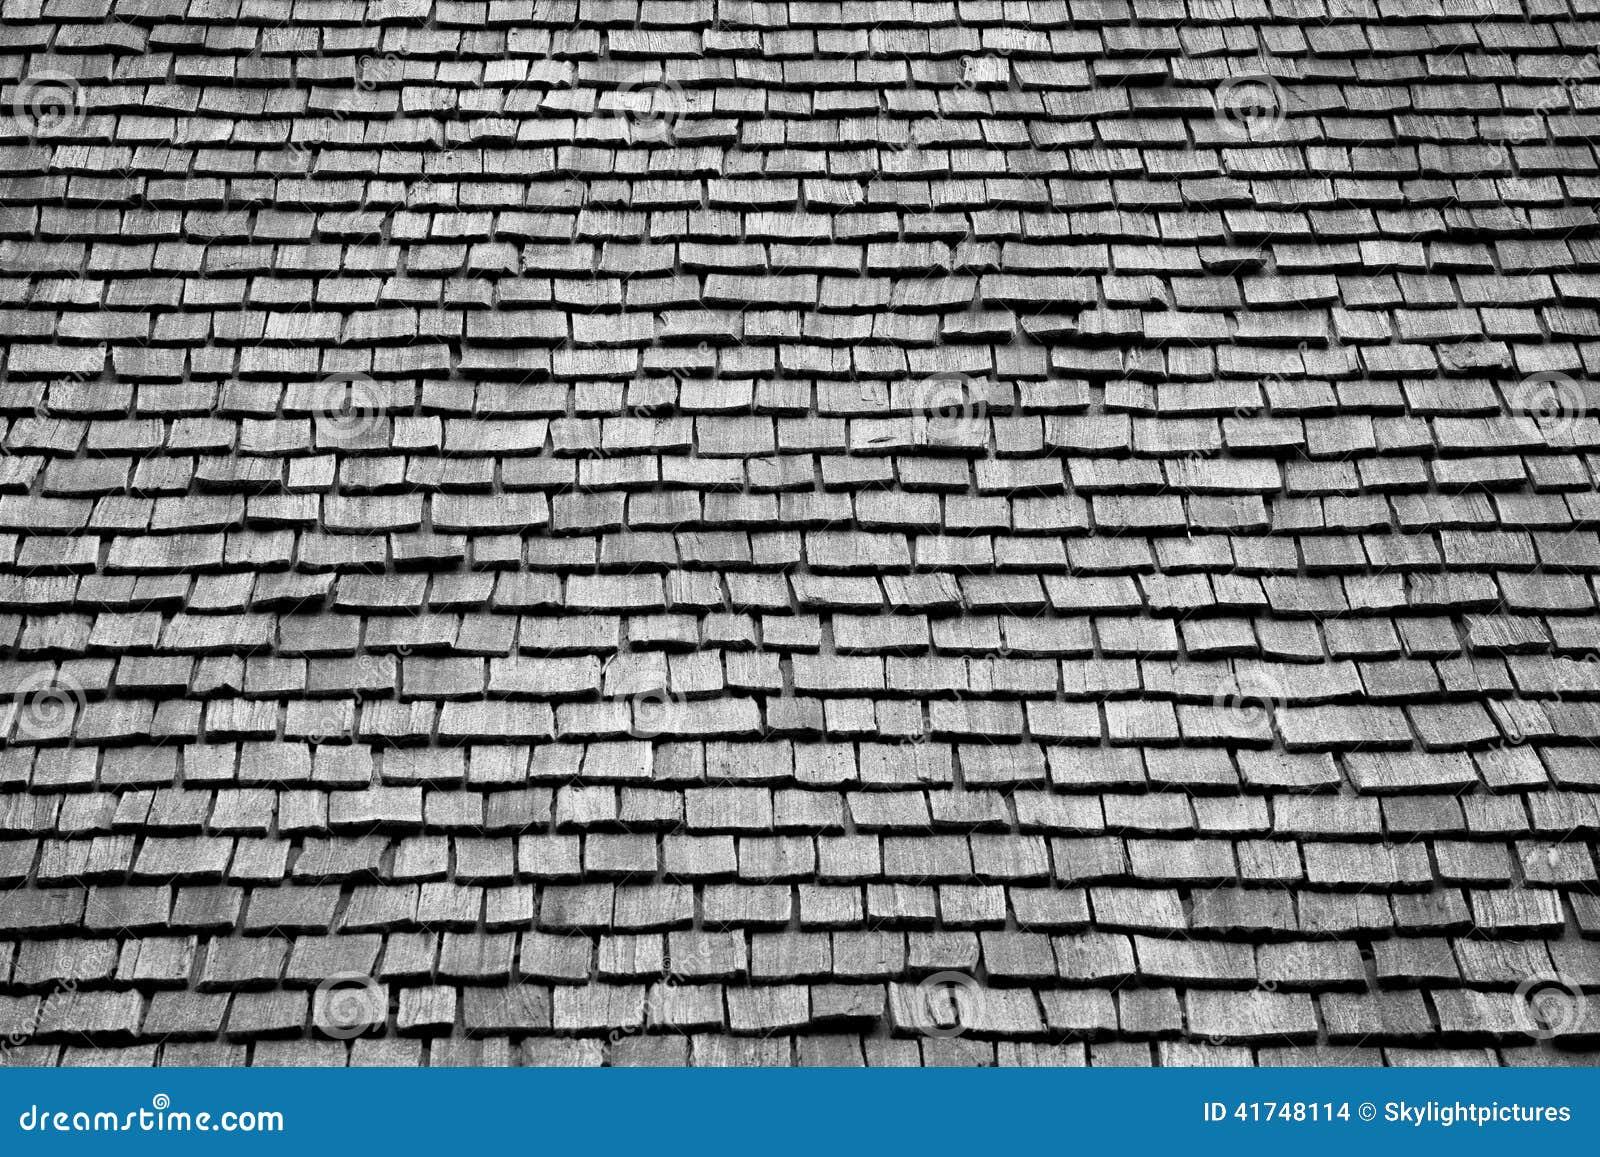 Roof Shingles Stock Photo Image Of Cedar Roof Shakes